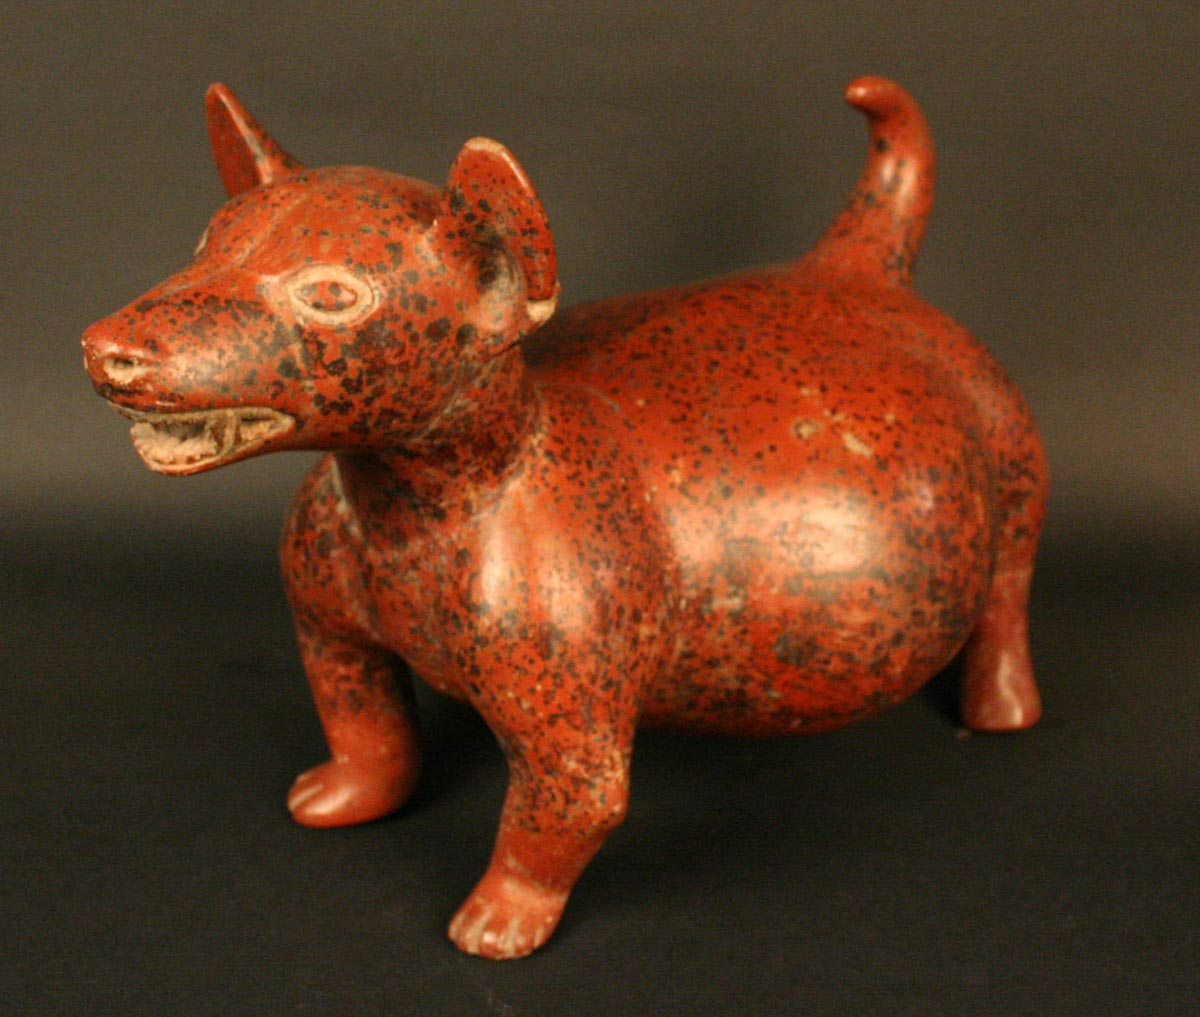 El mirador impaciente cultura capacha i for Que es ceramica